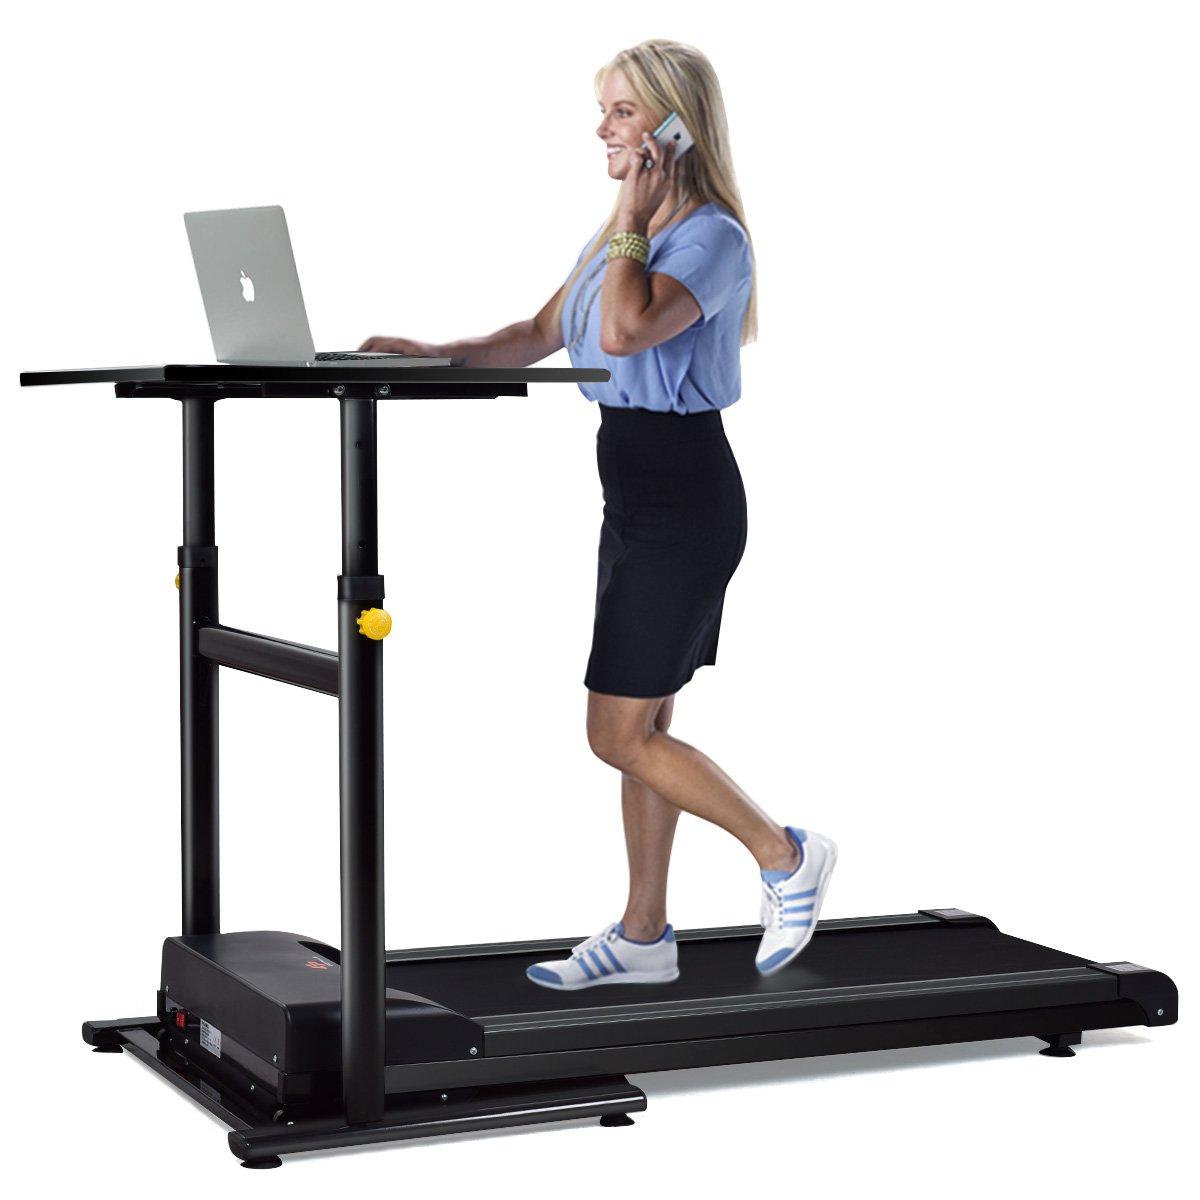 sports com outdoors under thinline amazon treadmill pro dp proform desk workout